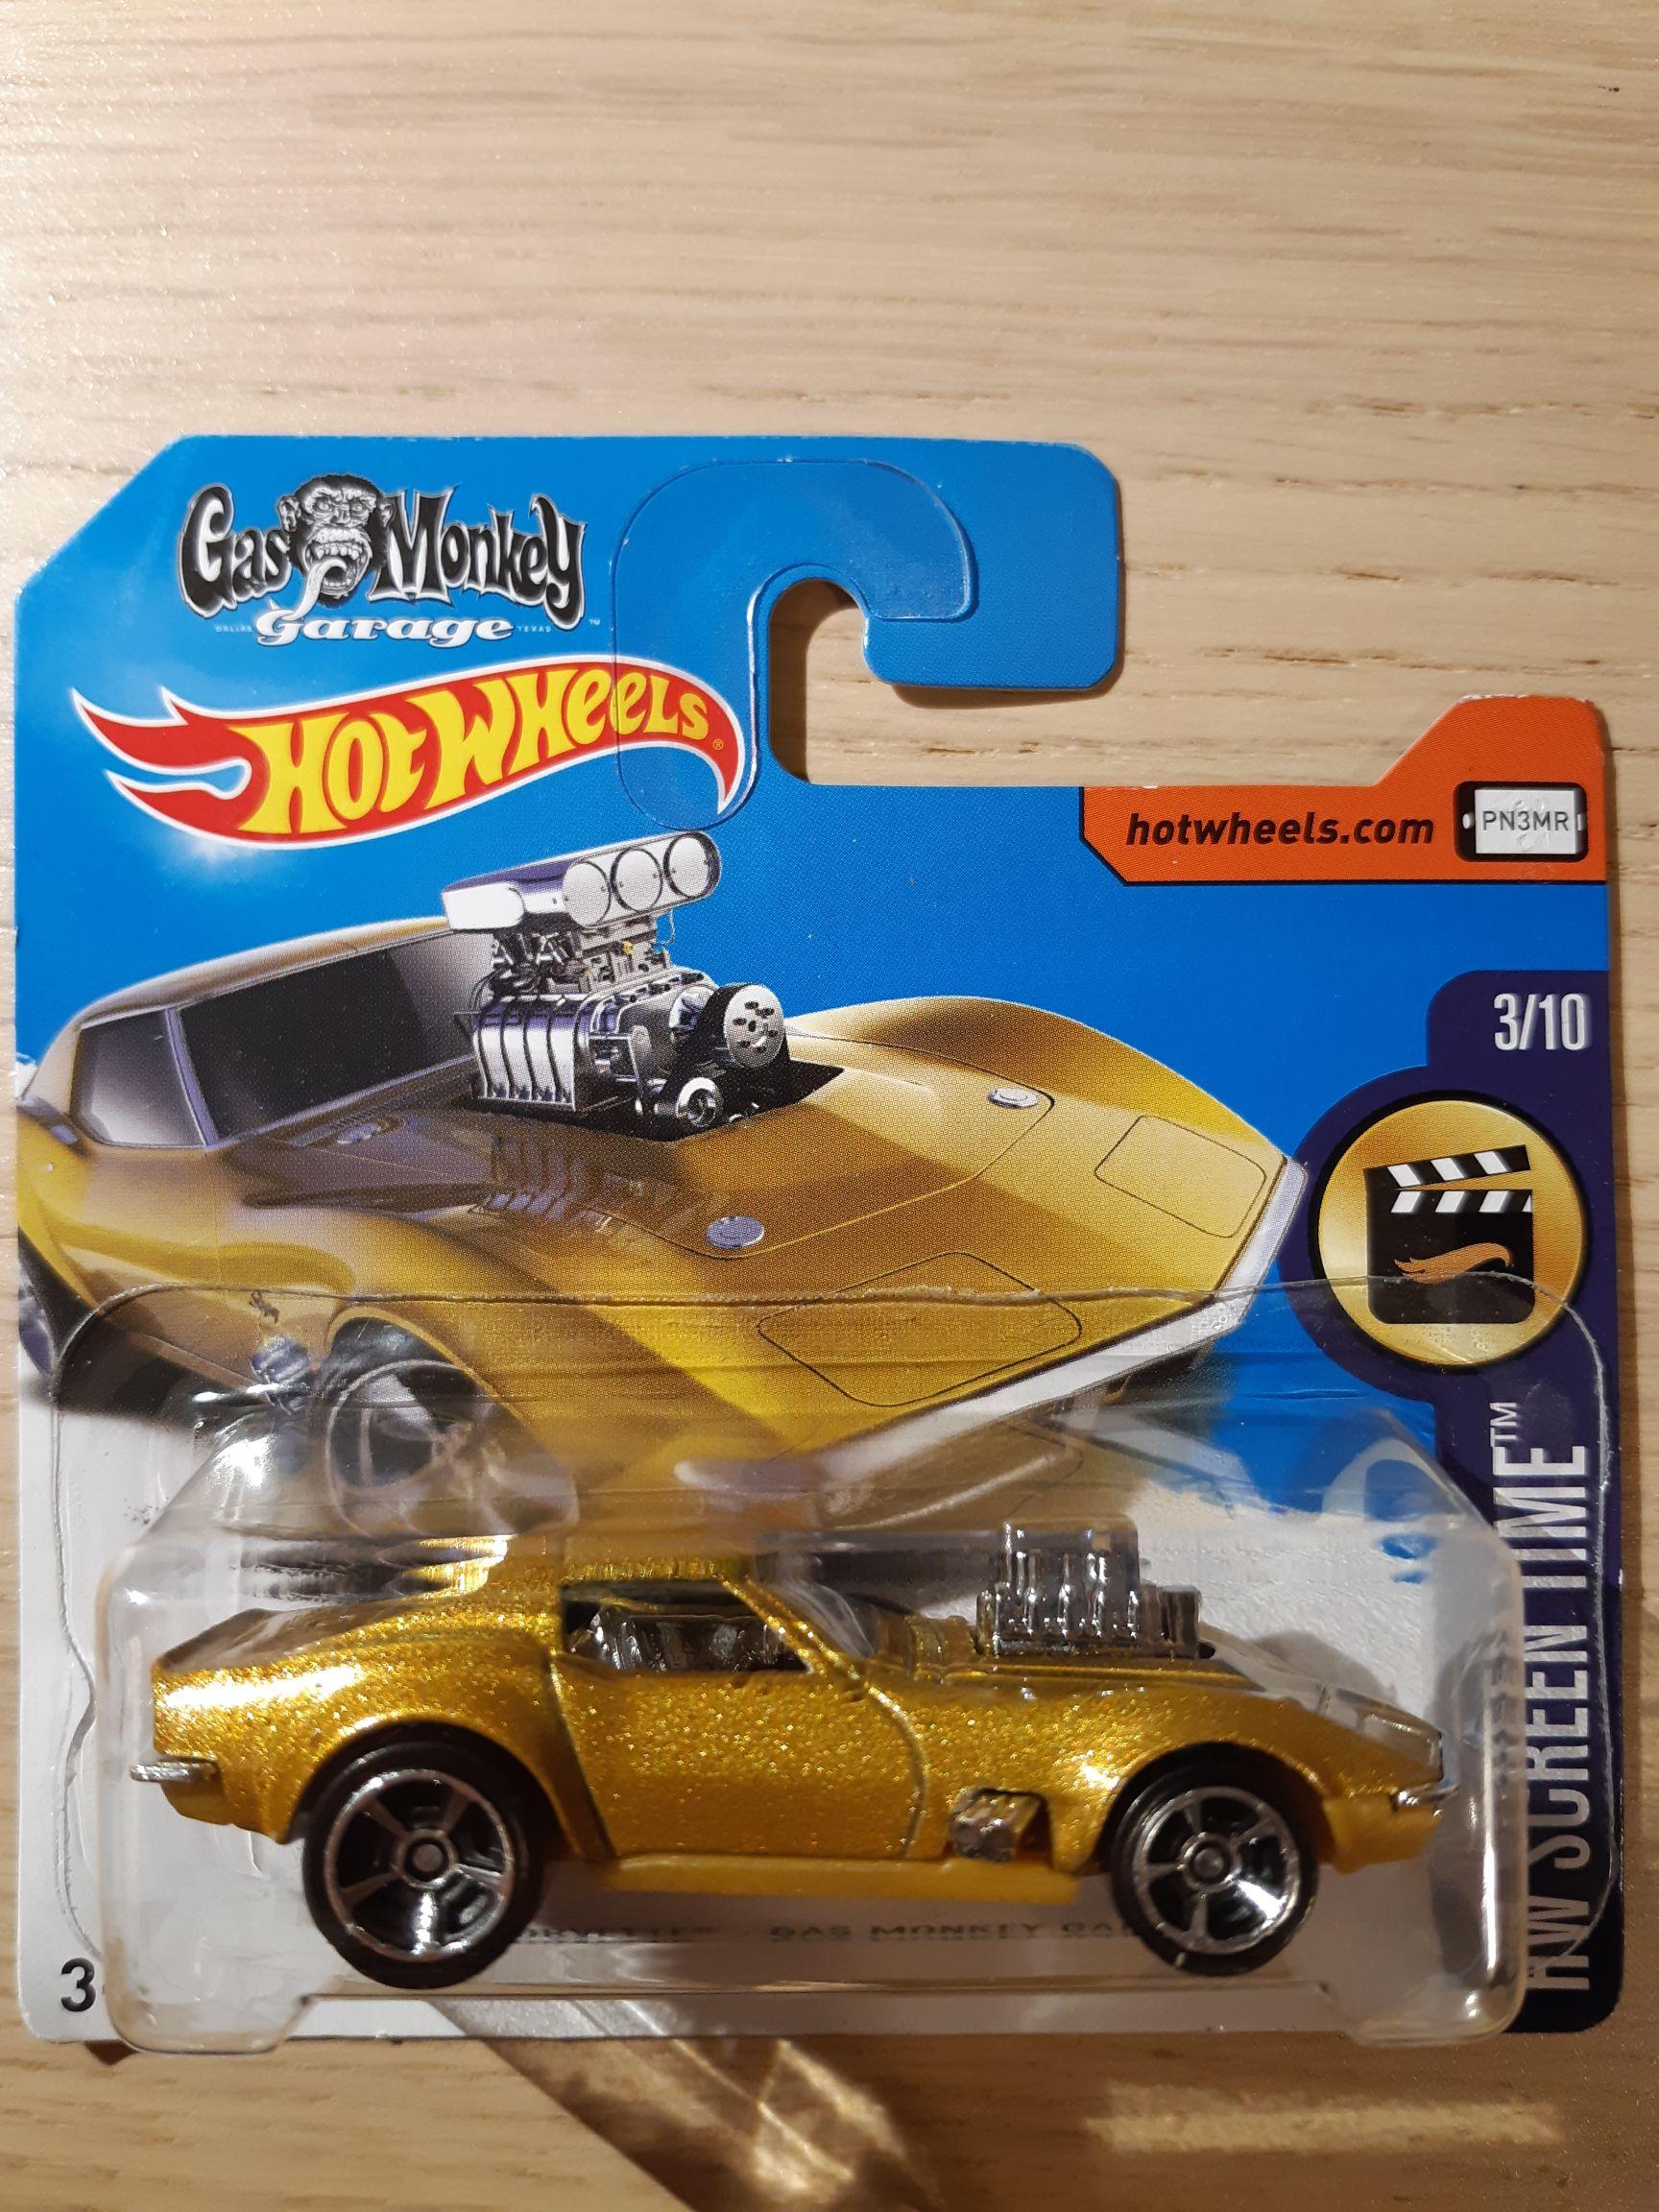 Corvette '68 Gas Monkey Garage Toy Car, Die Cast, And Hot